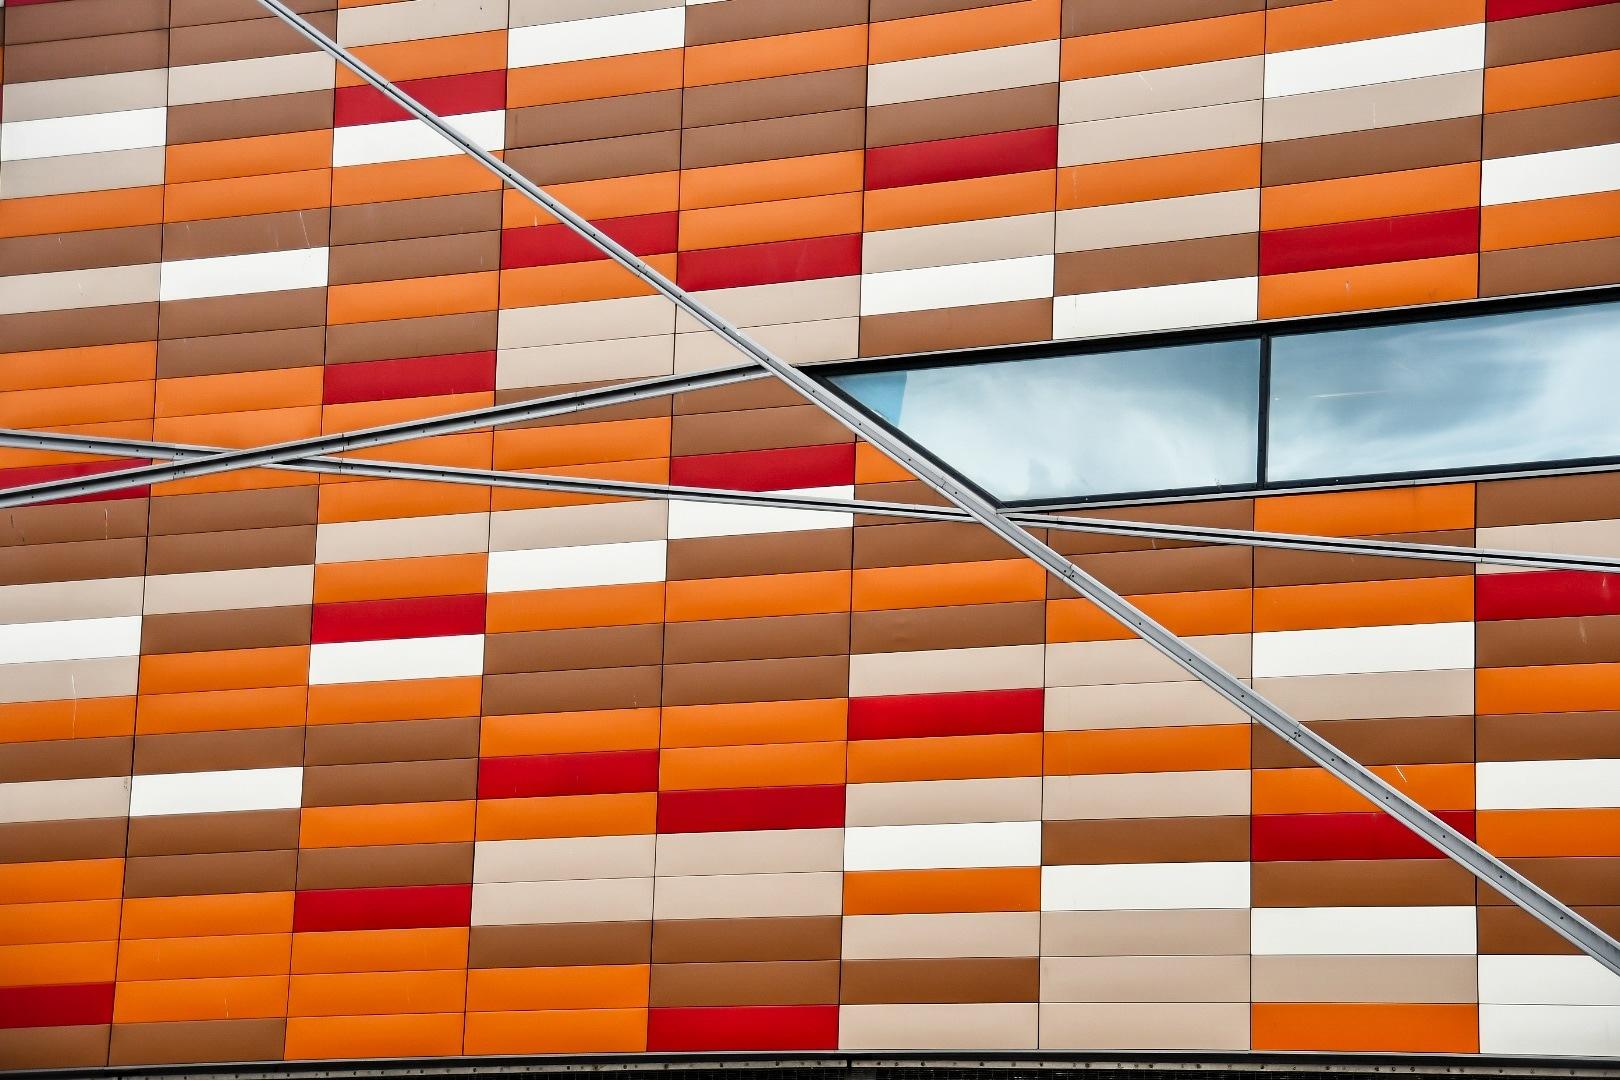 Bright Bricks of colour by Matthias Davis